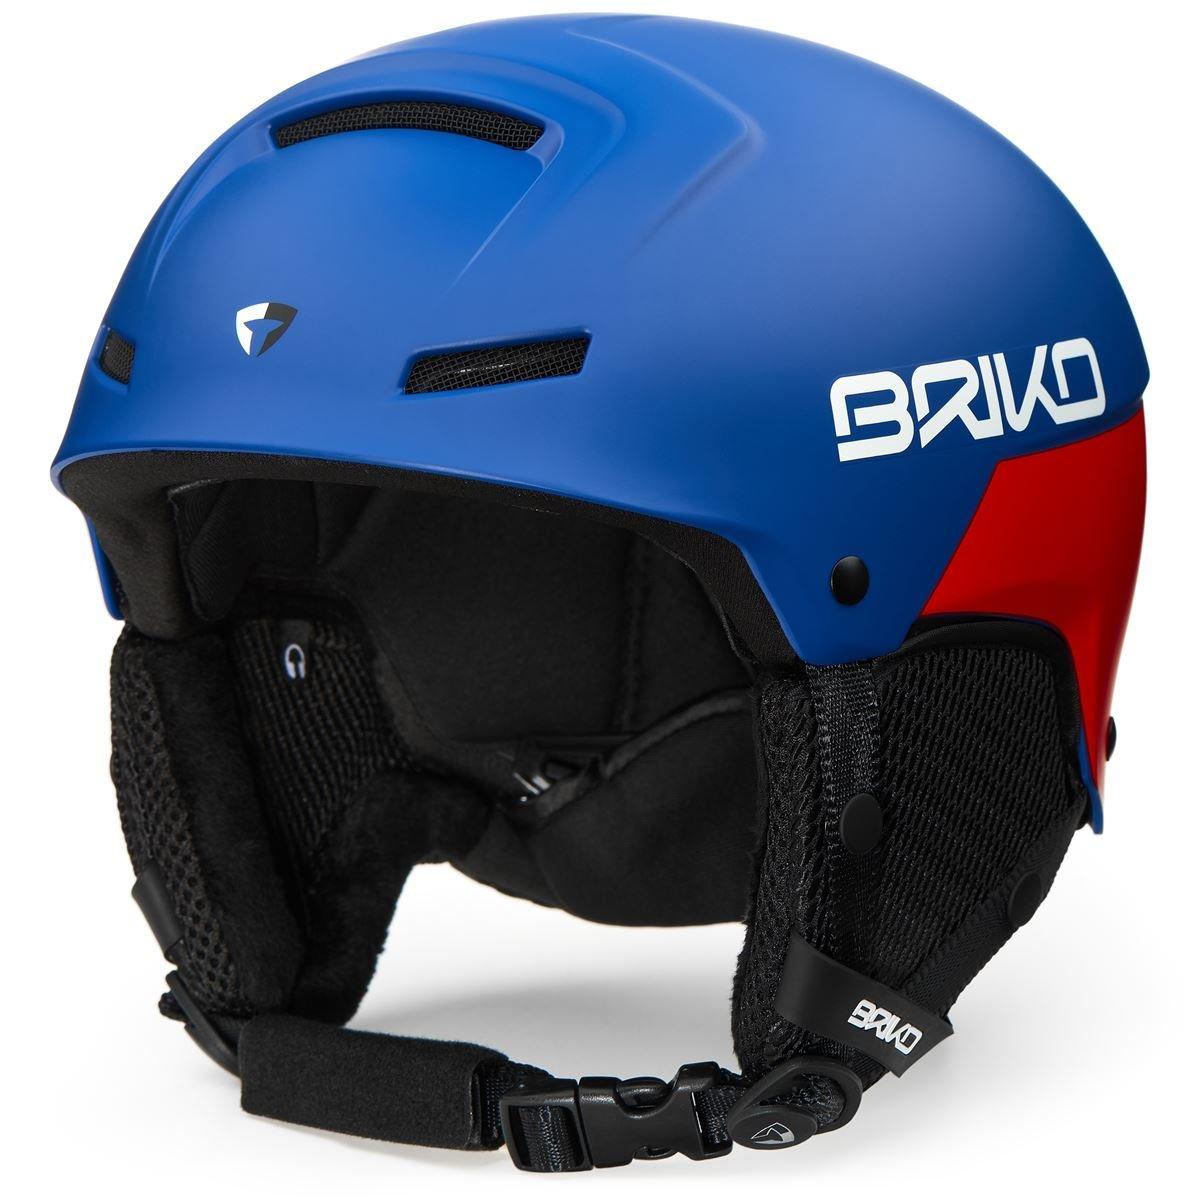 Briko mammoth mat Blue/red BRI-1038